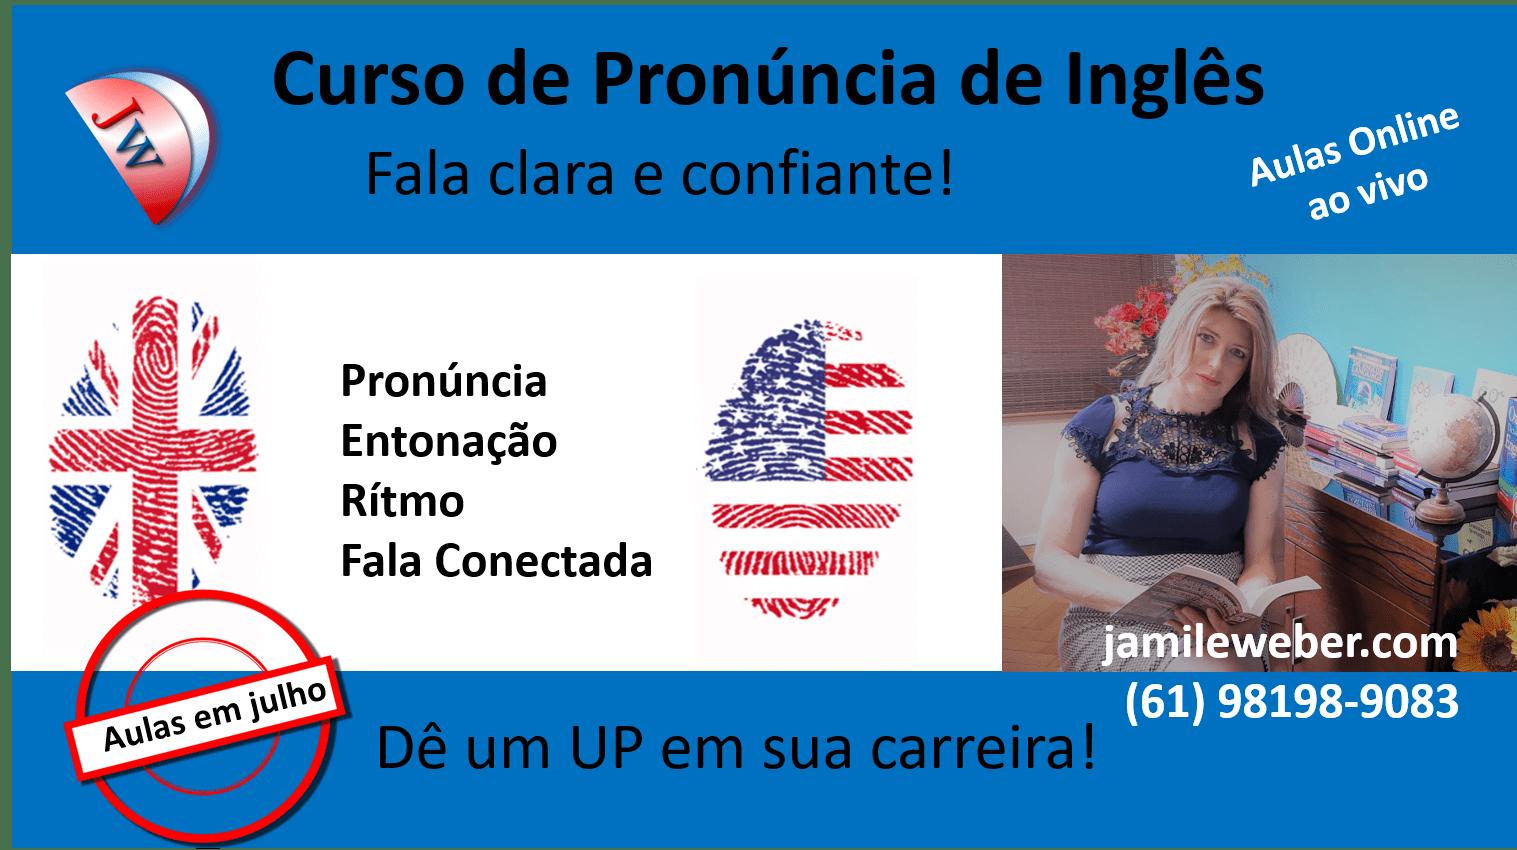 Campanha julho 2020 Portugues